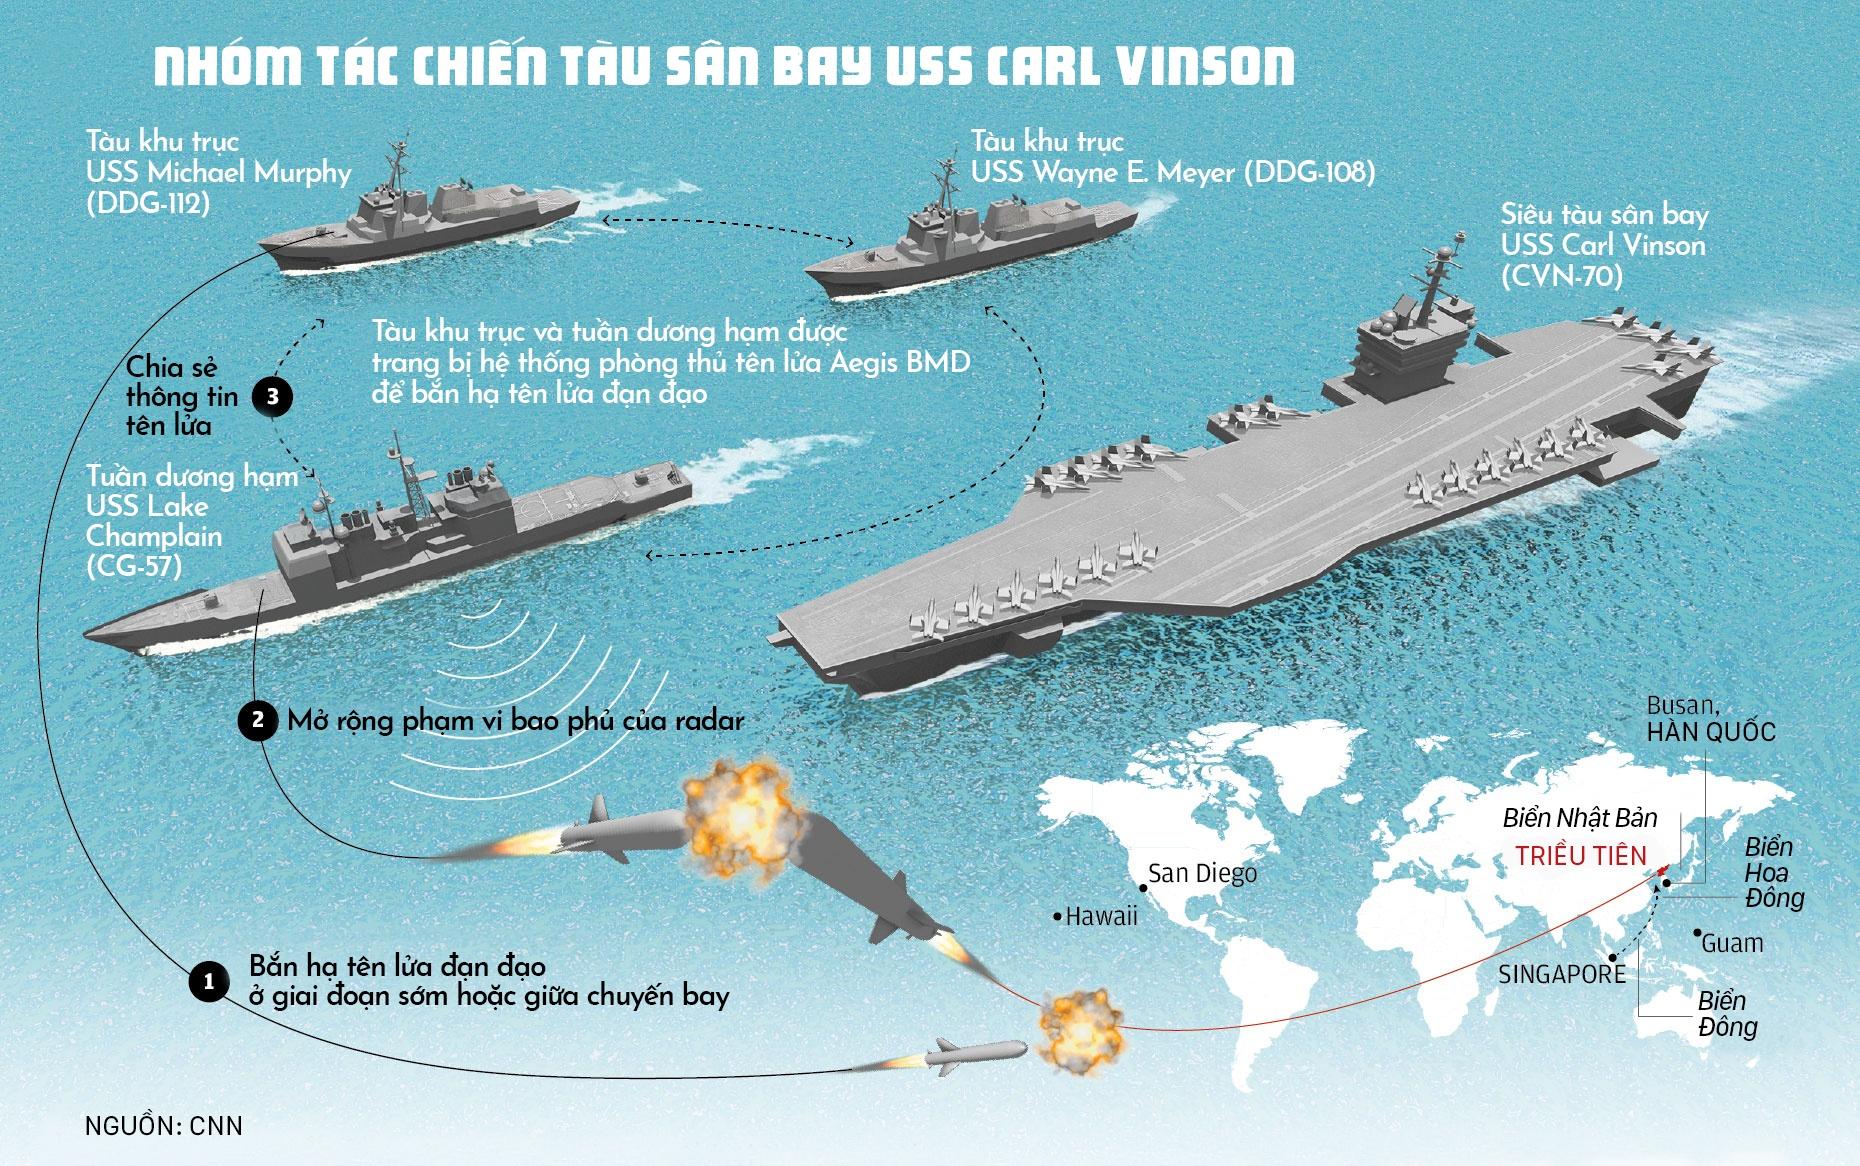 USS Carl Vinson toi Da Nang: Uy luc 'phao dai noi' tren bien hinh anh 8